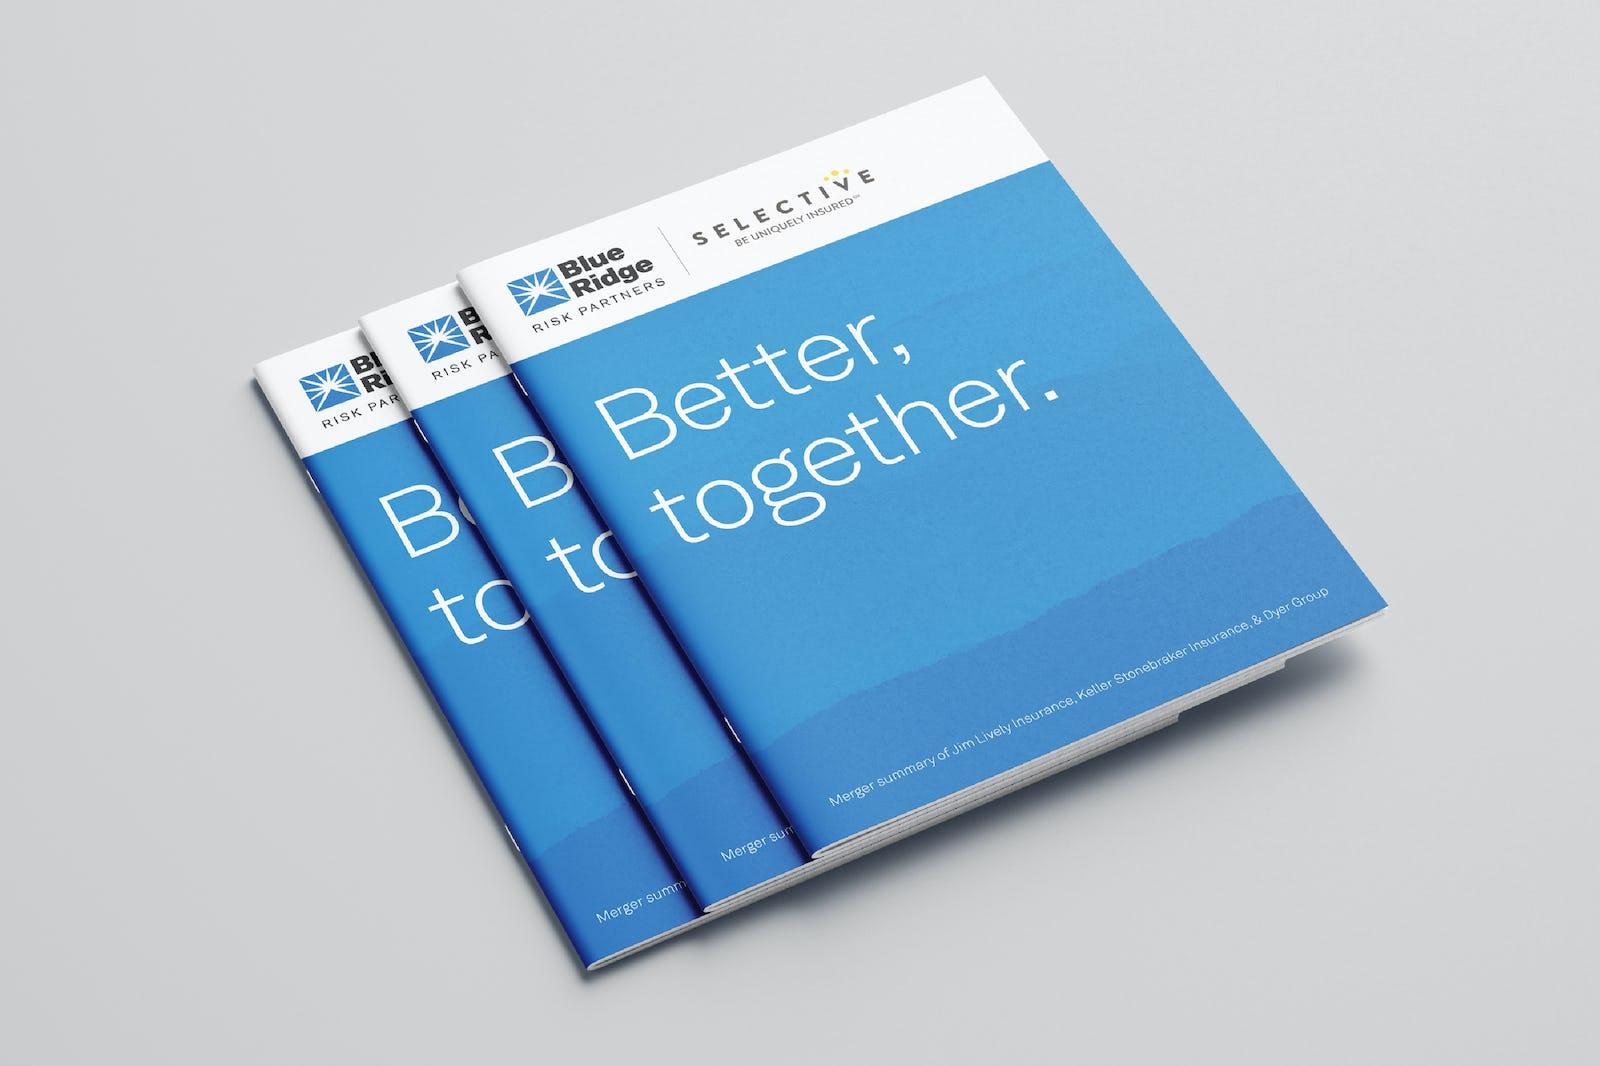 Blue Ridge booklet cover